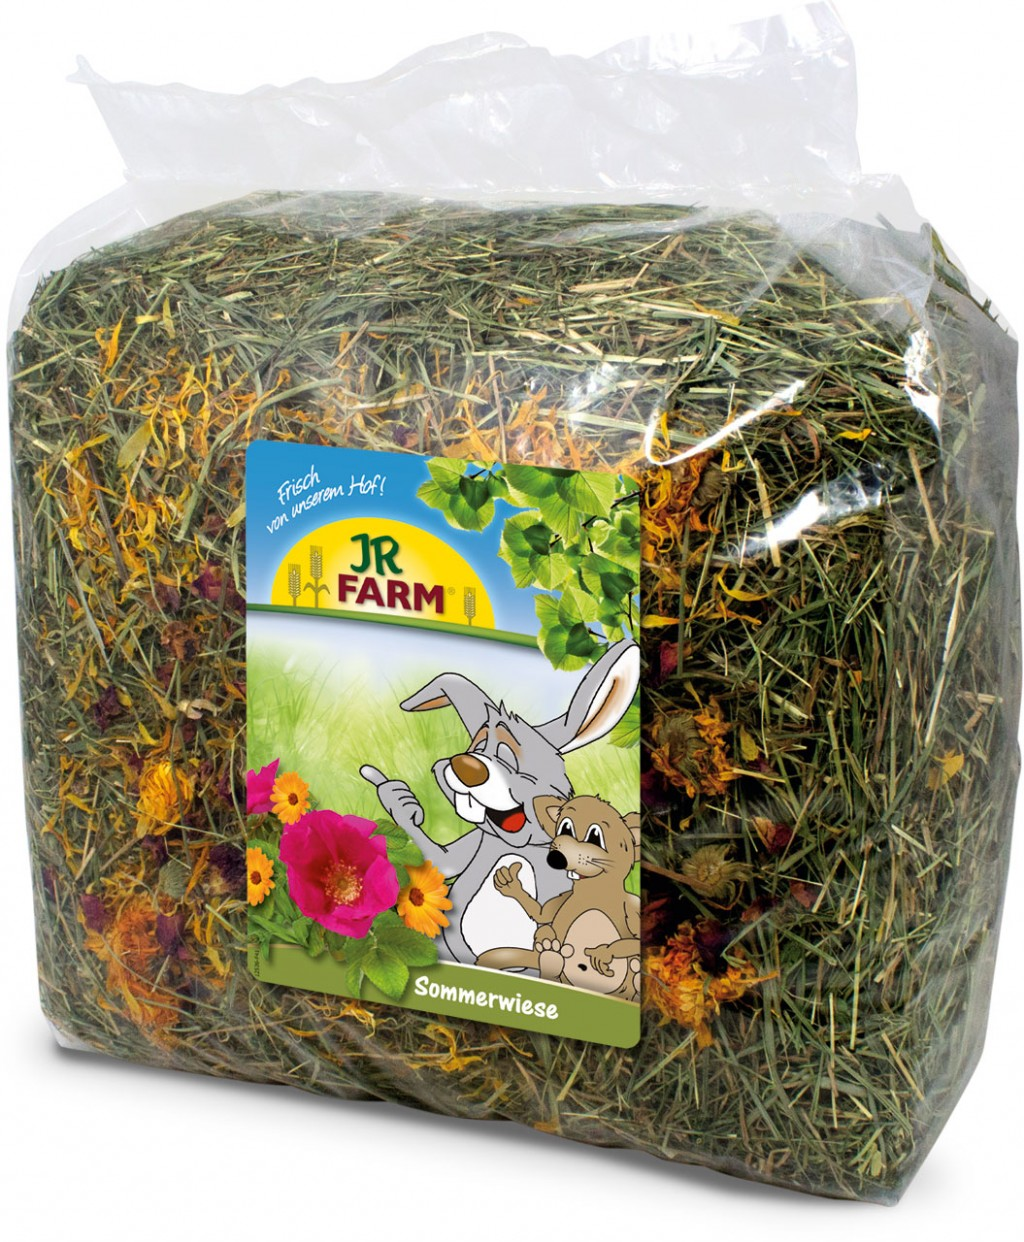 JR Farm Сено премиум класса для грызунов, в ассортименте, 500 г